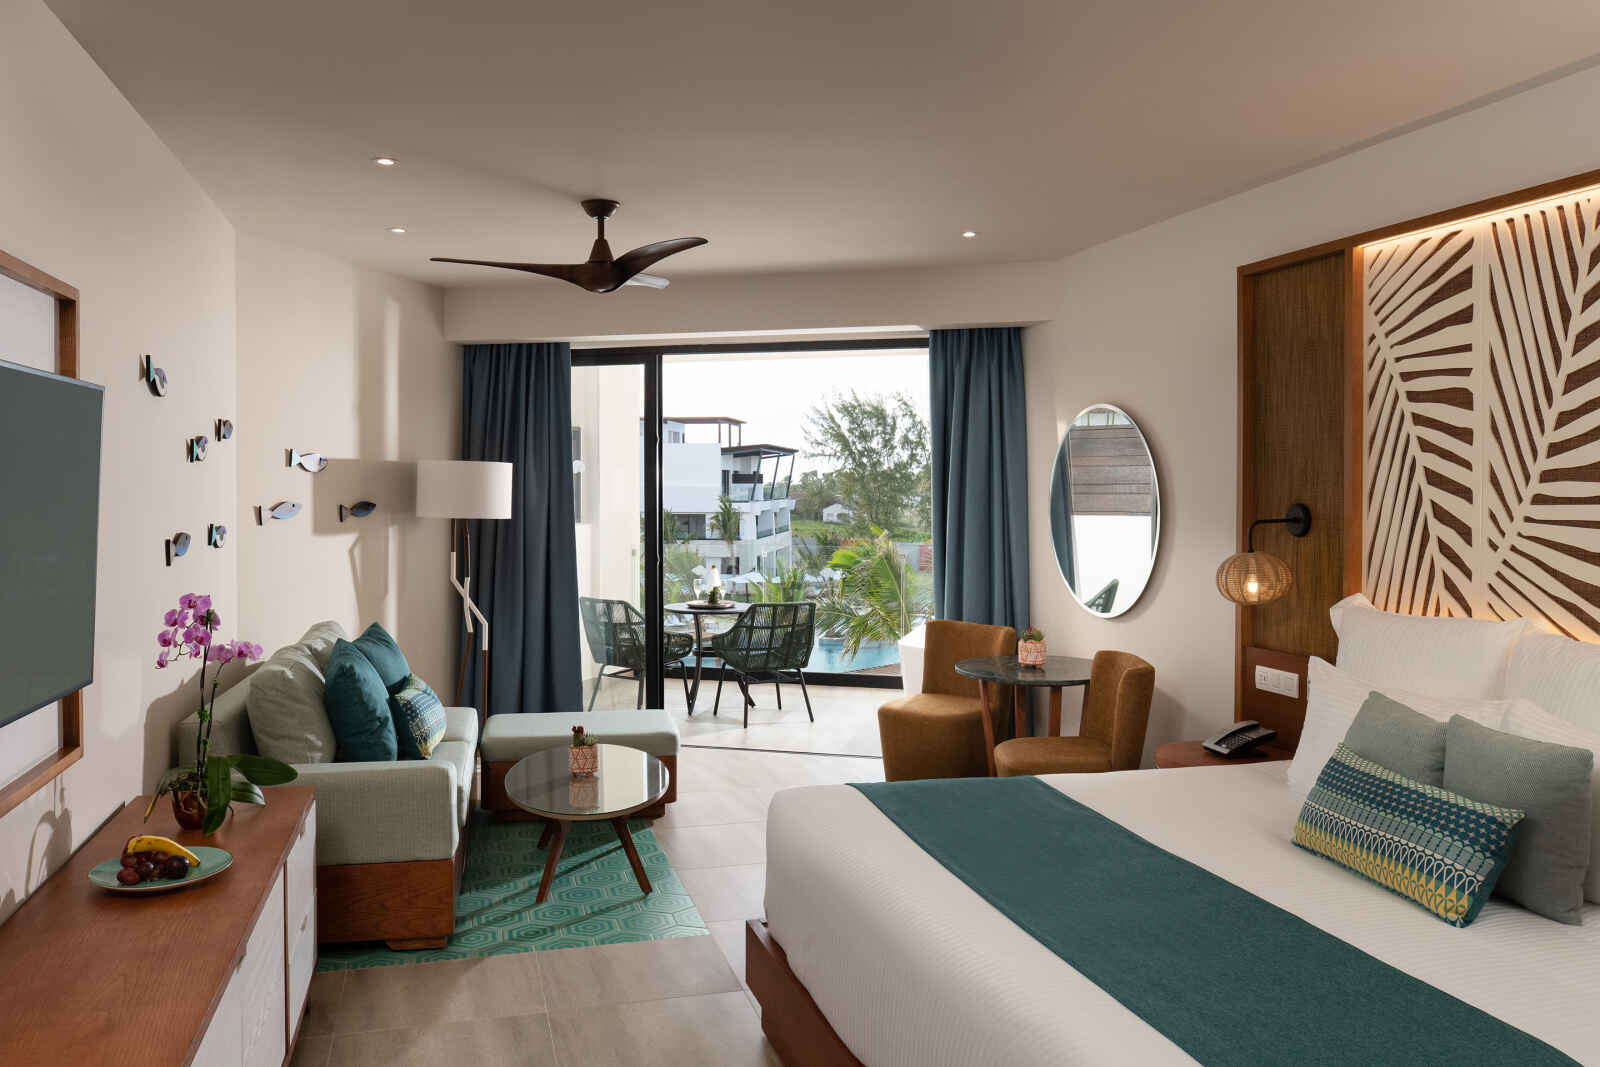 République Dominicaine - Playa Macao - Hôtel Dreams Macao Beach Punta Cana 5*